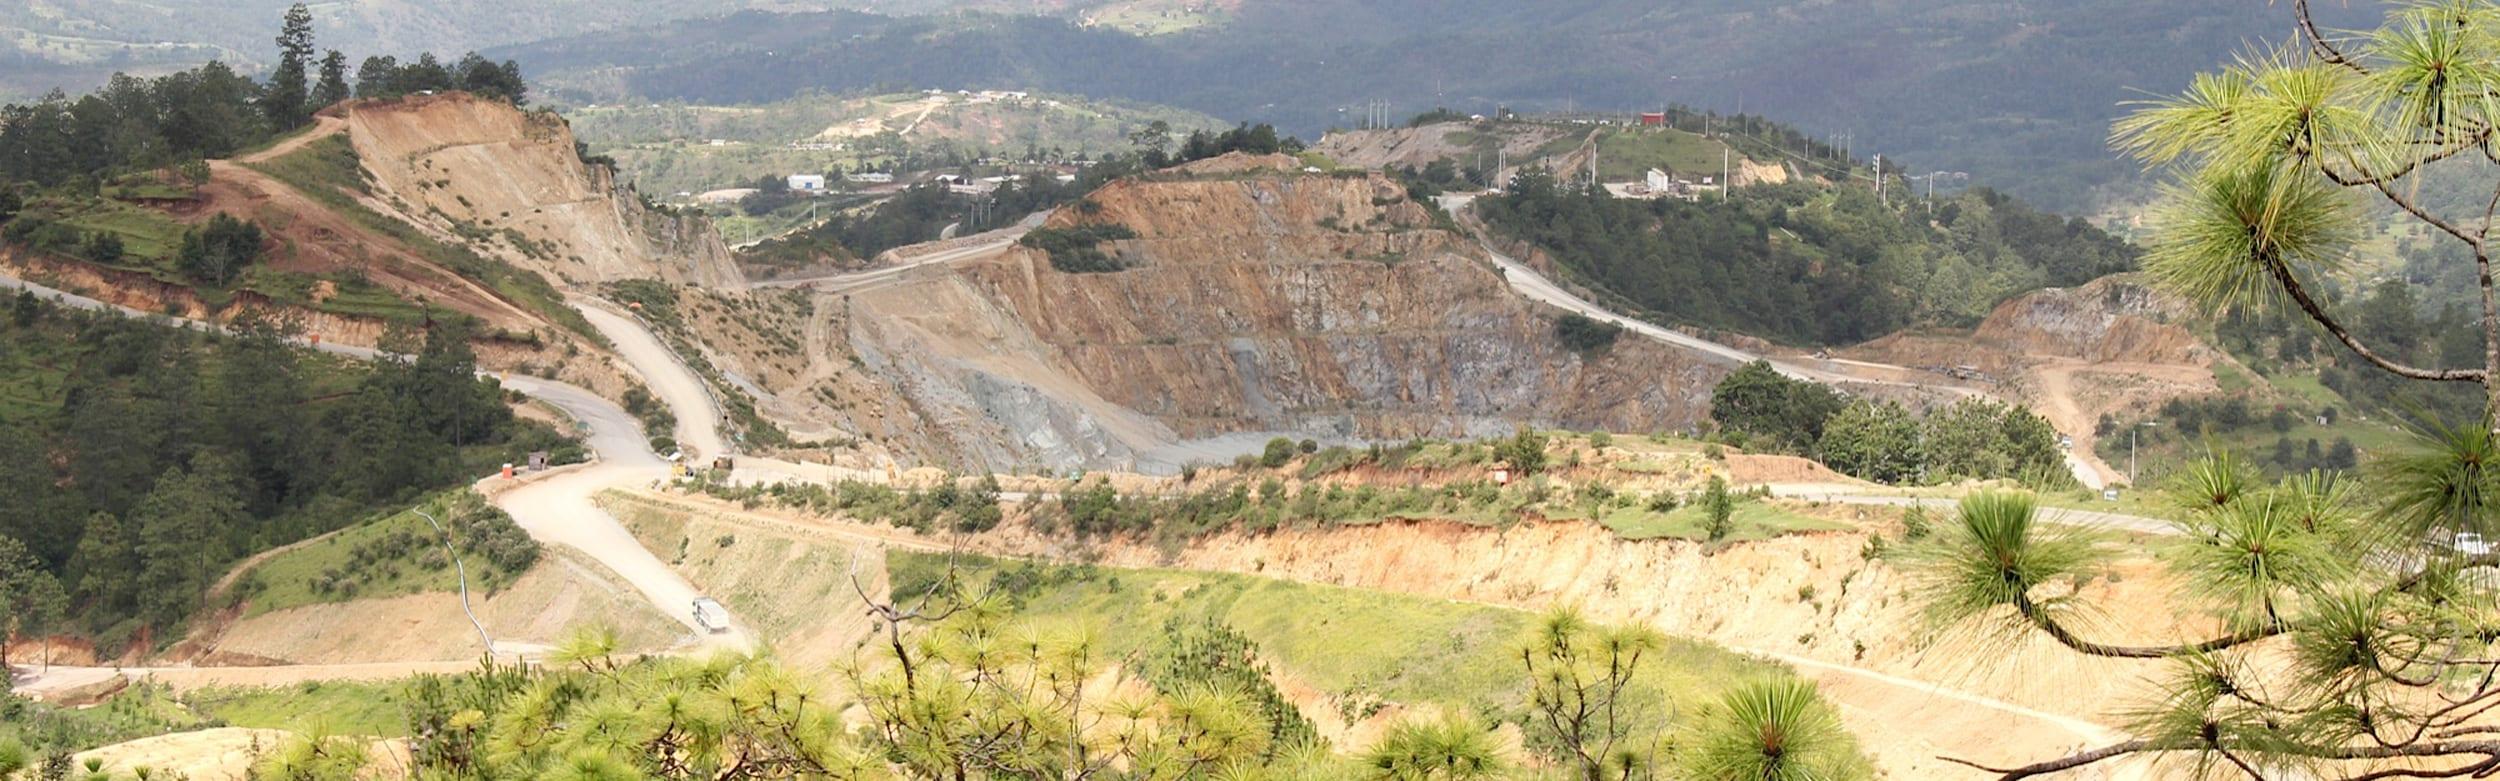 Feature - Guatemala Mines